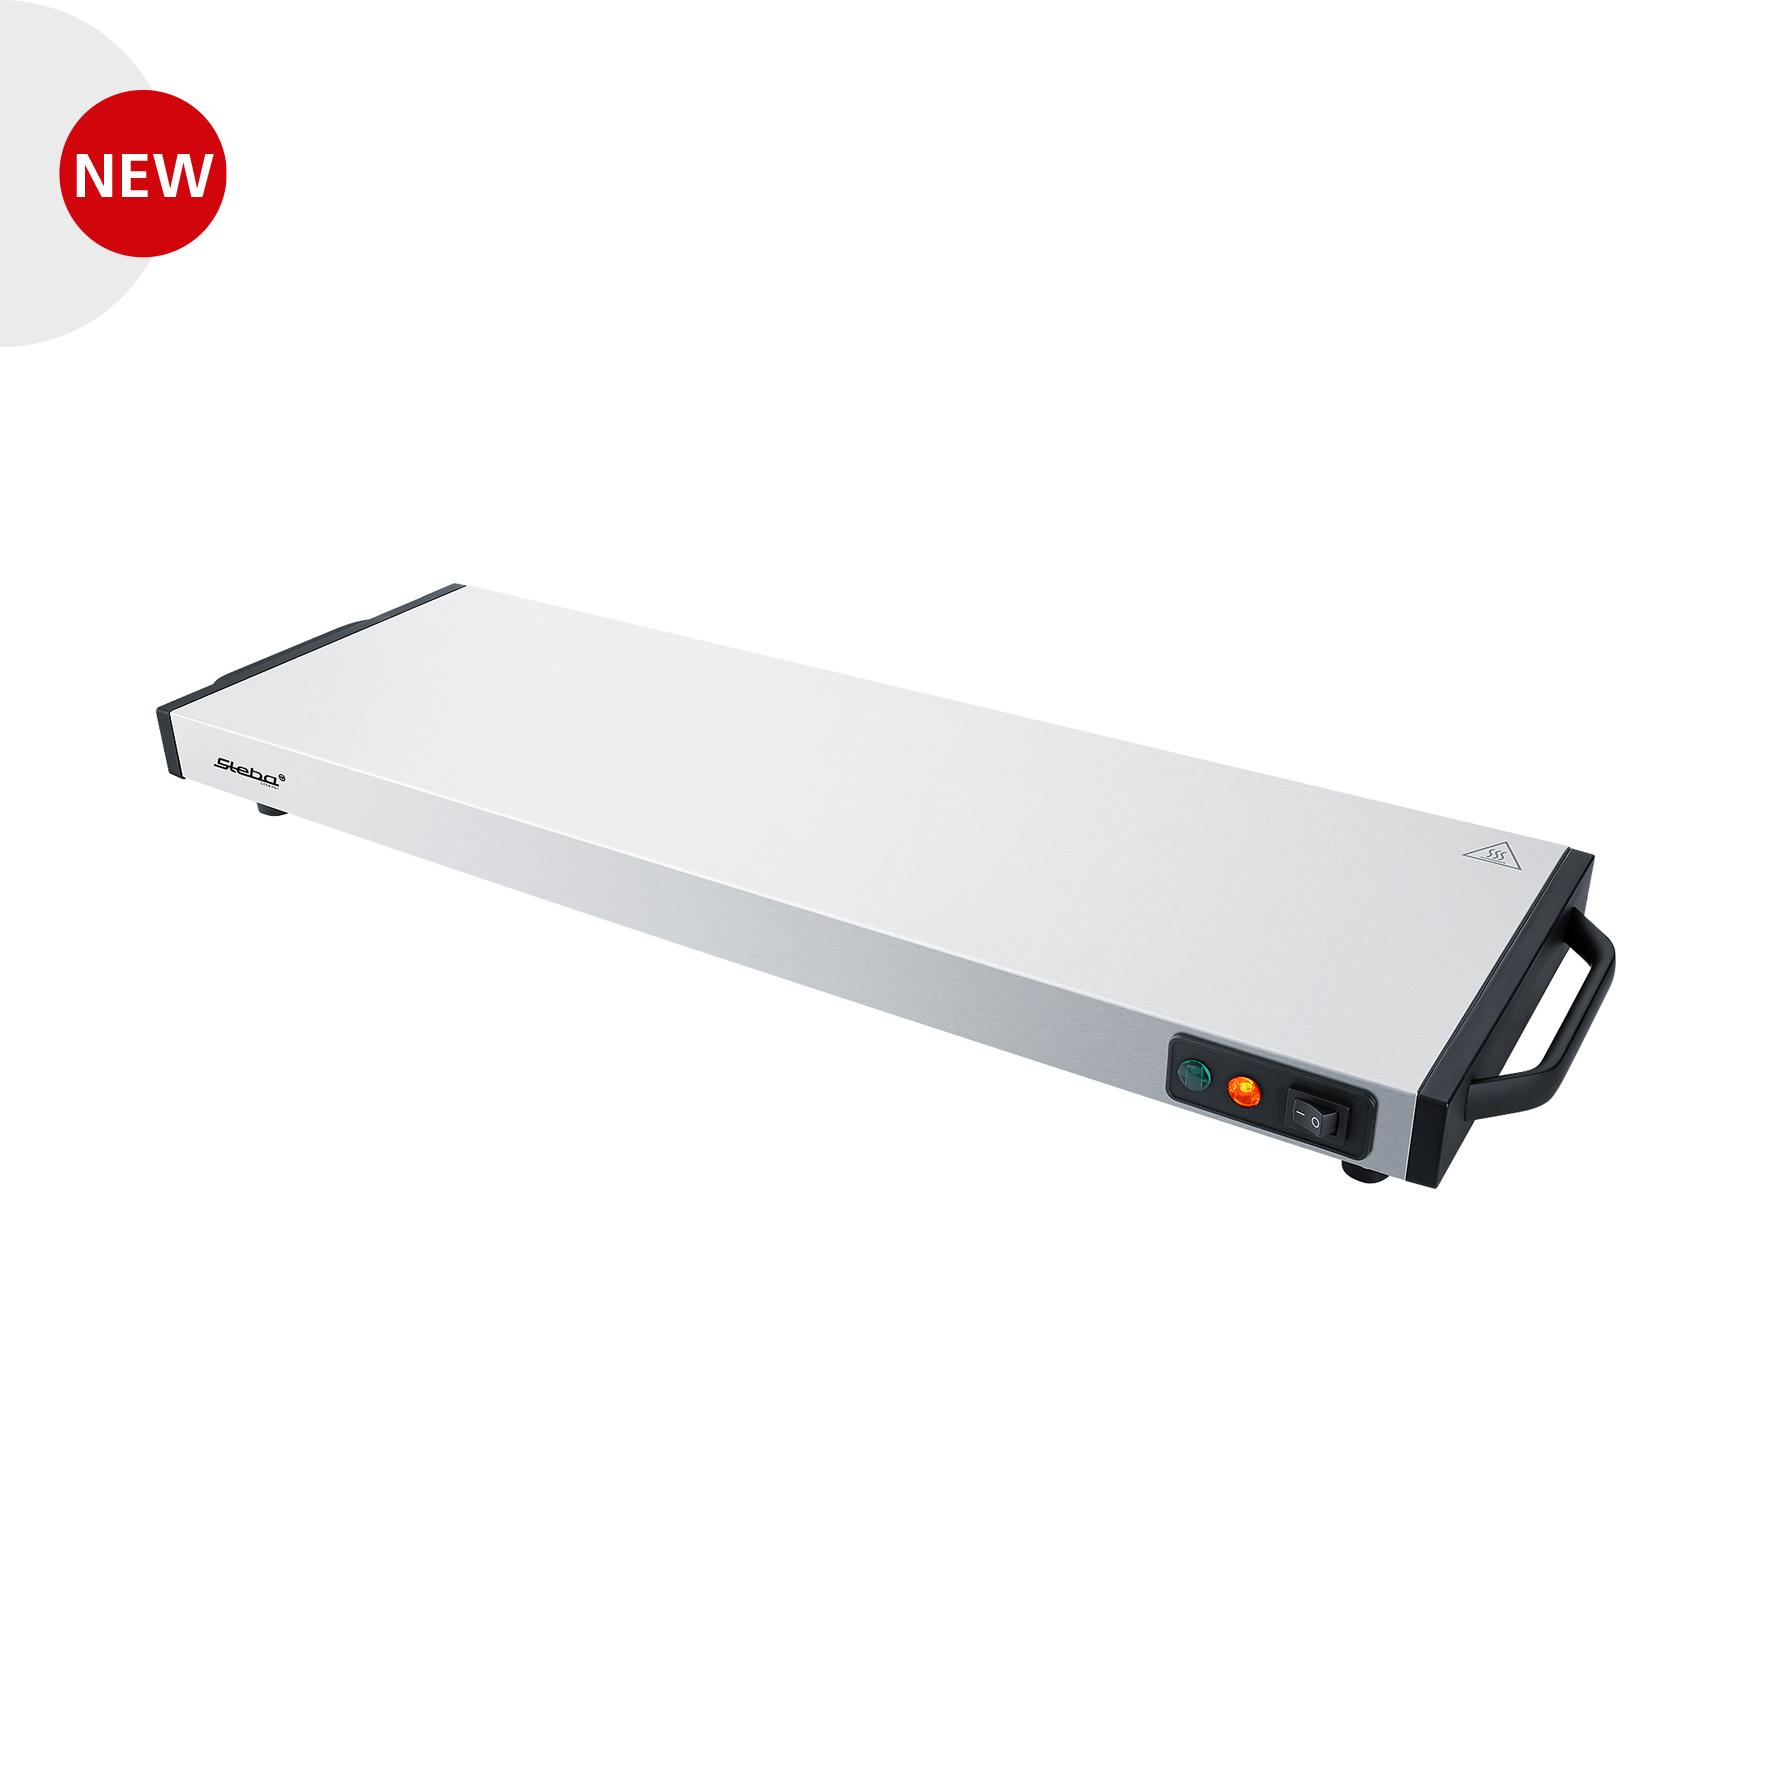 Steba WP120 Wärmespeicherplatte